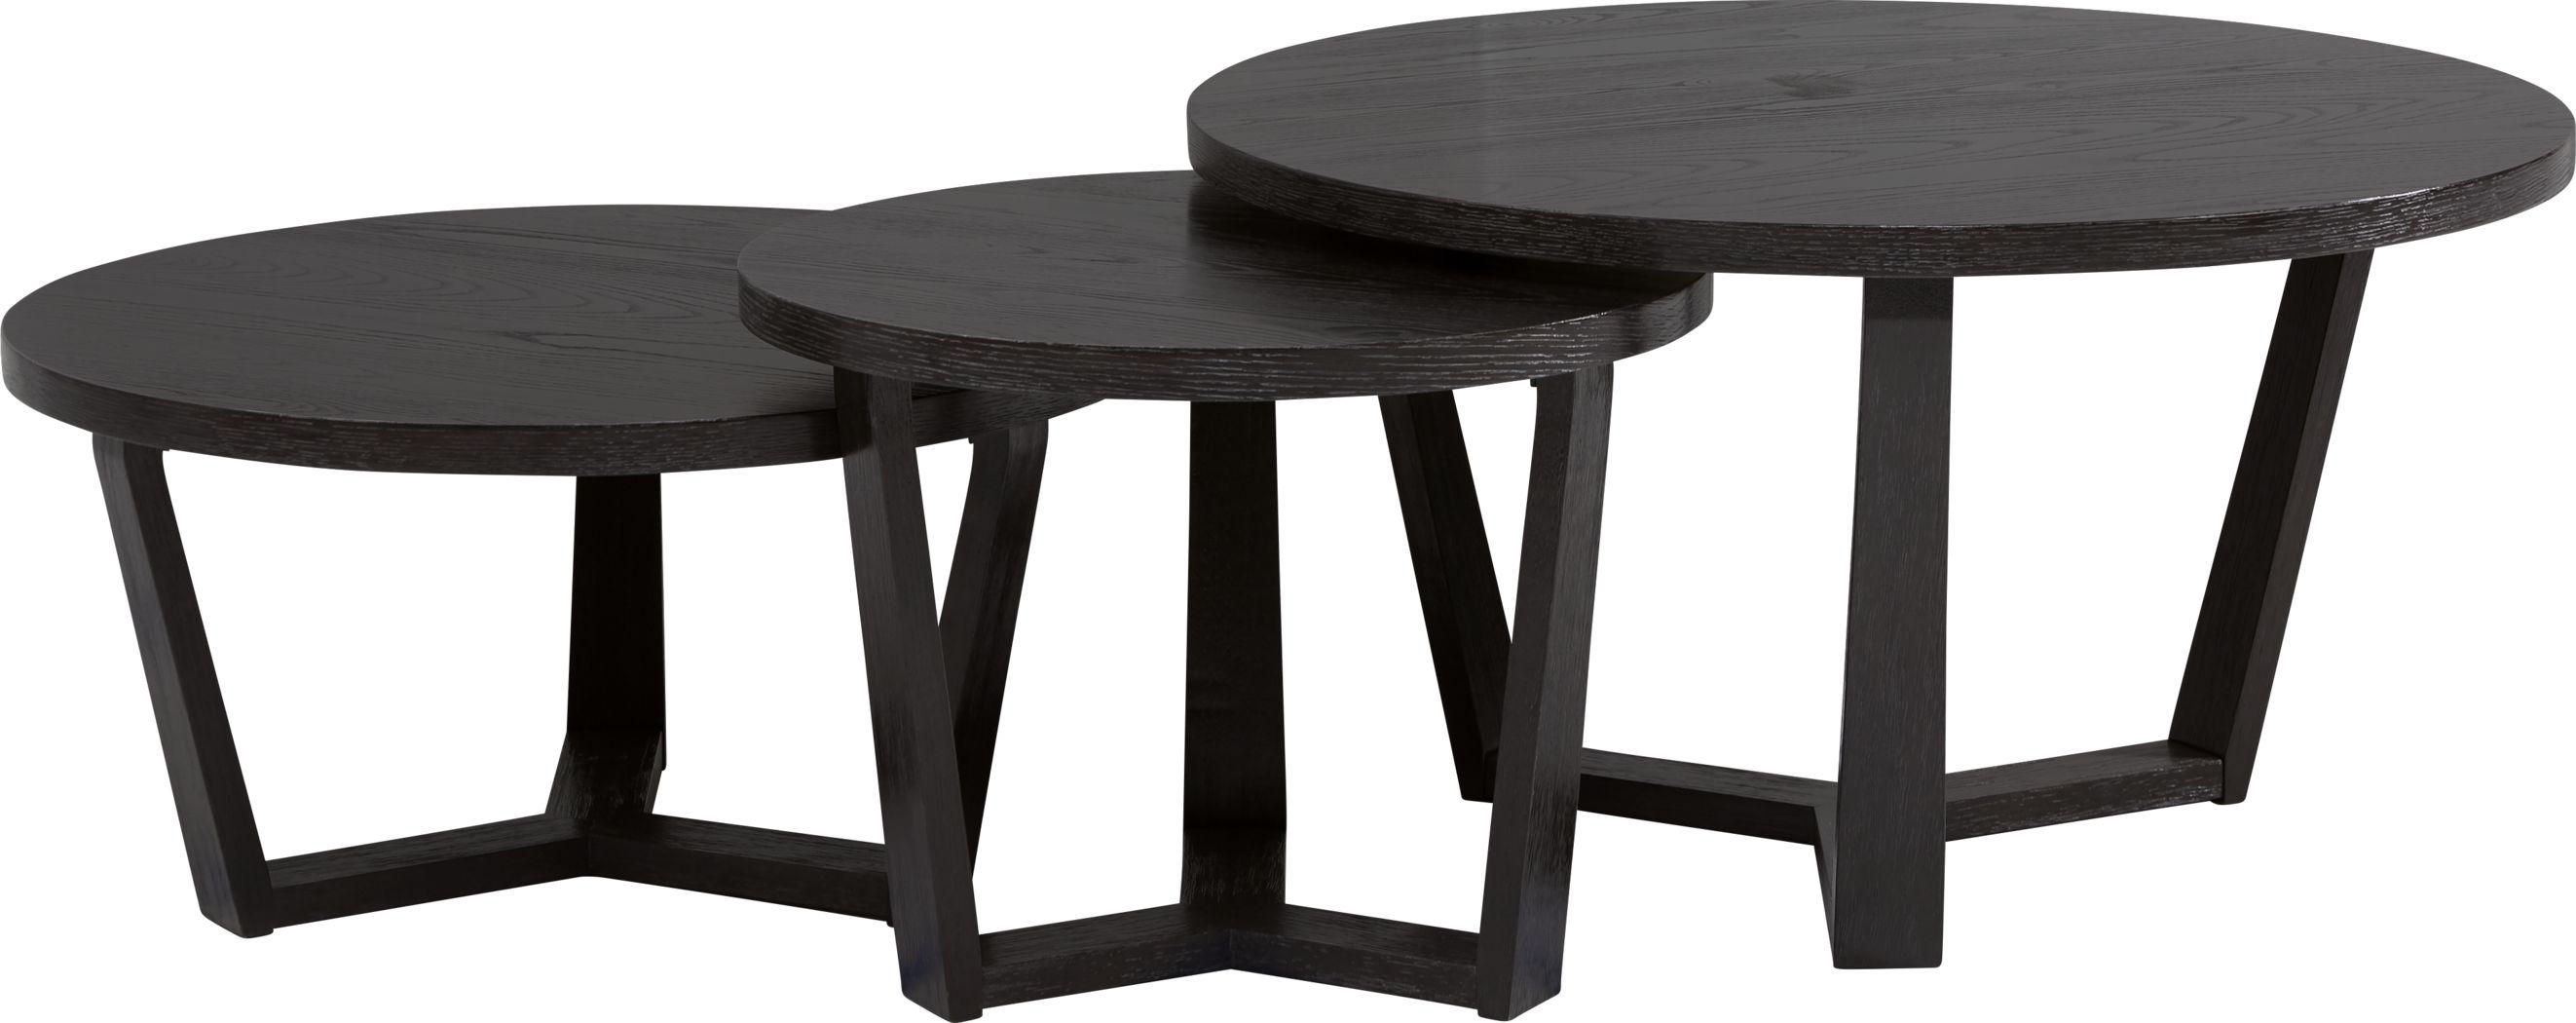 Rumie Dark Brown 3 Pc Nesting Cocktail Table Set